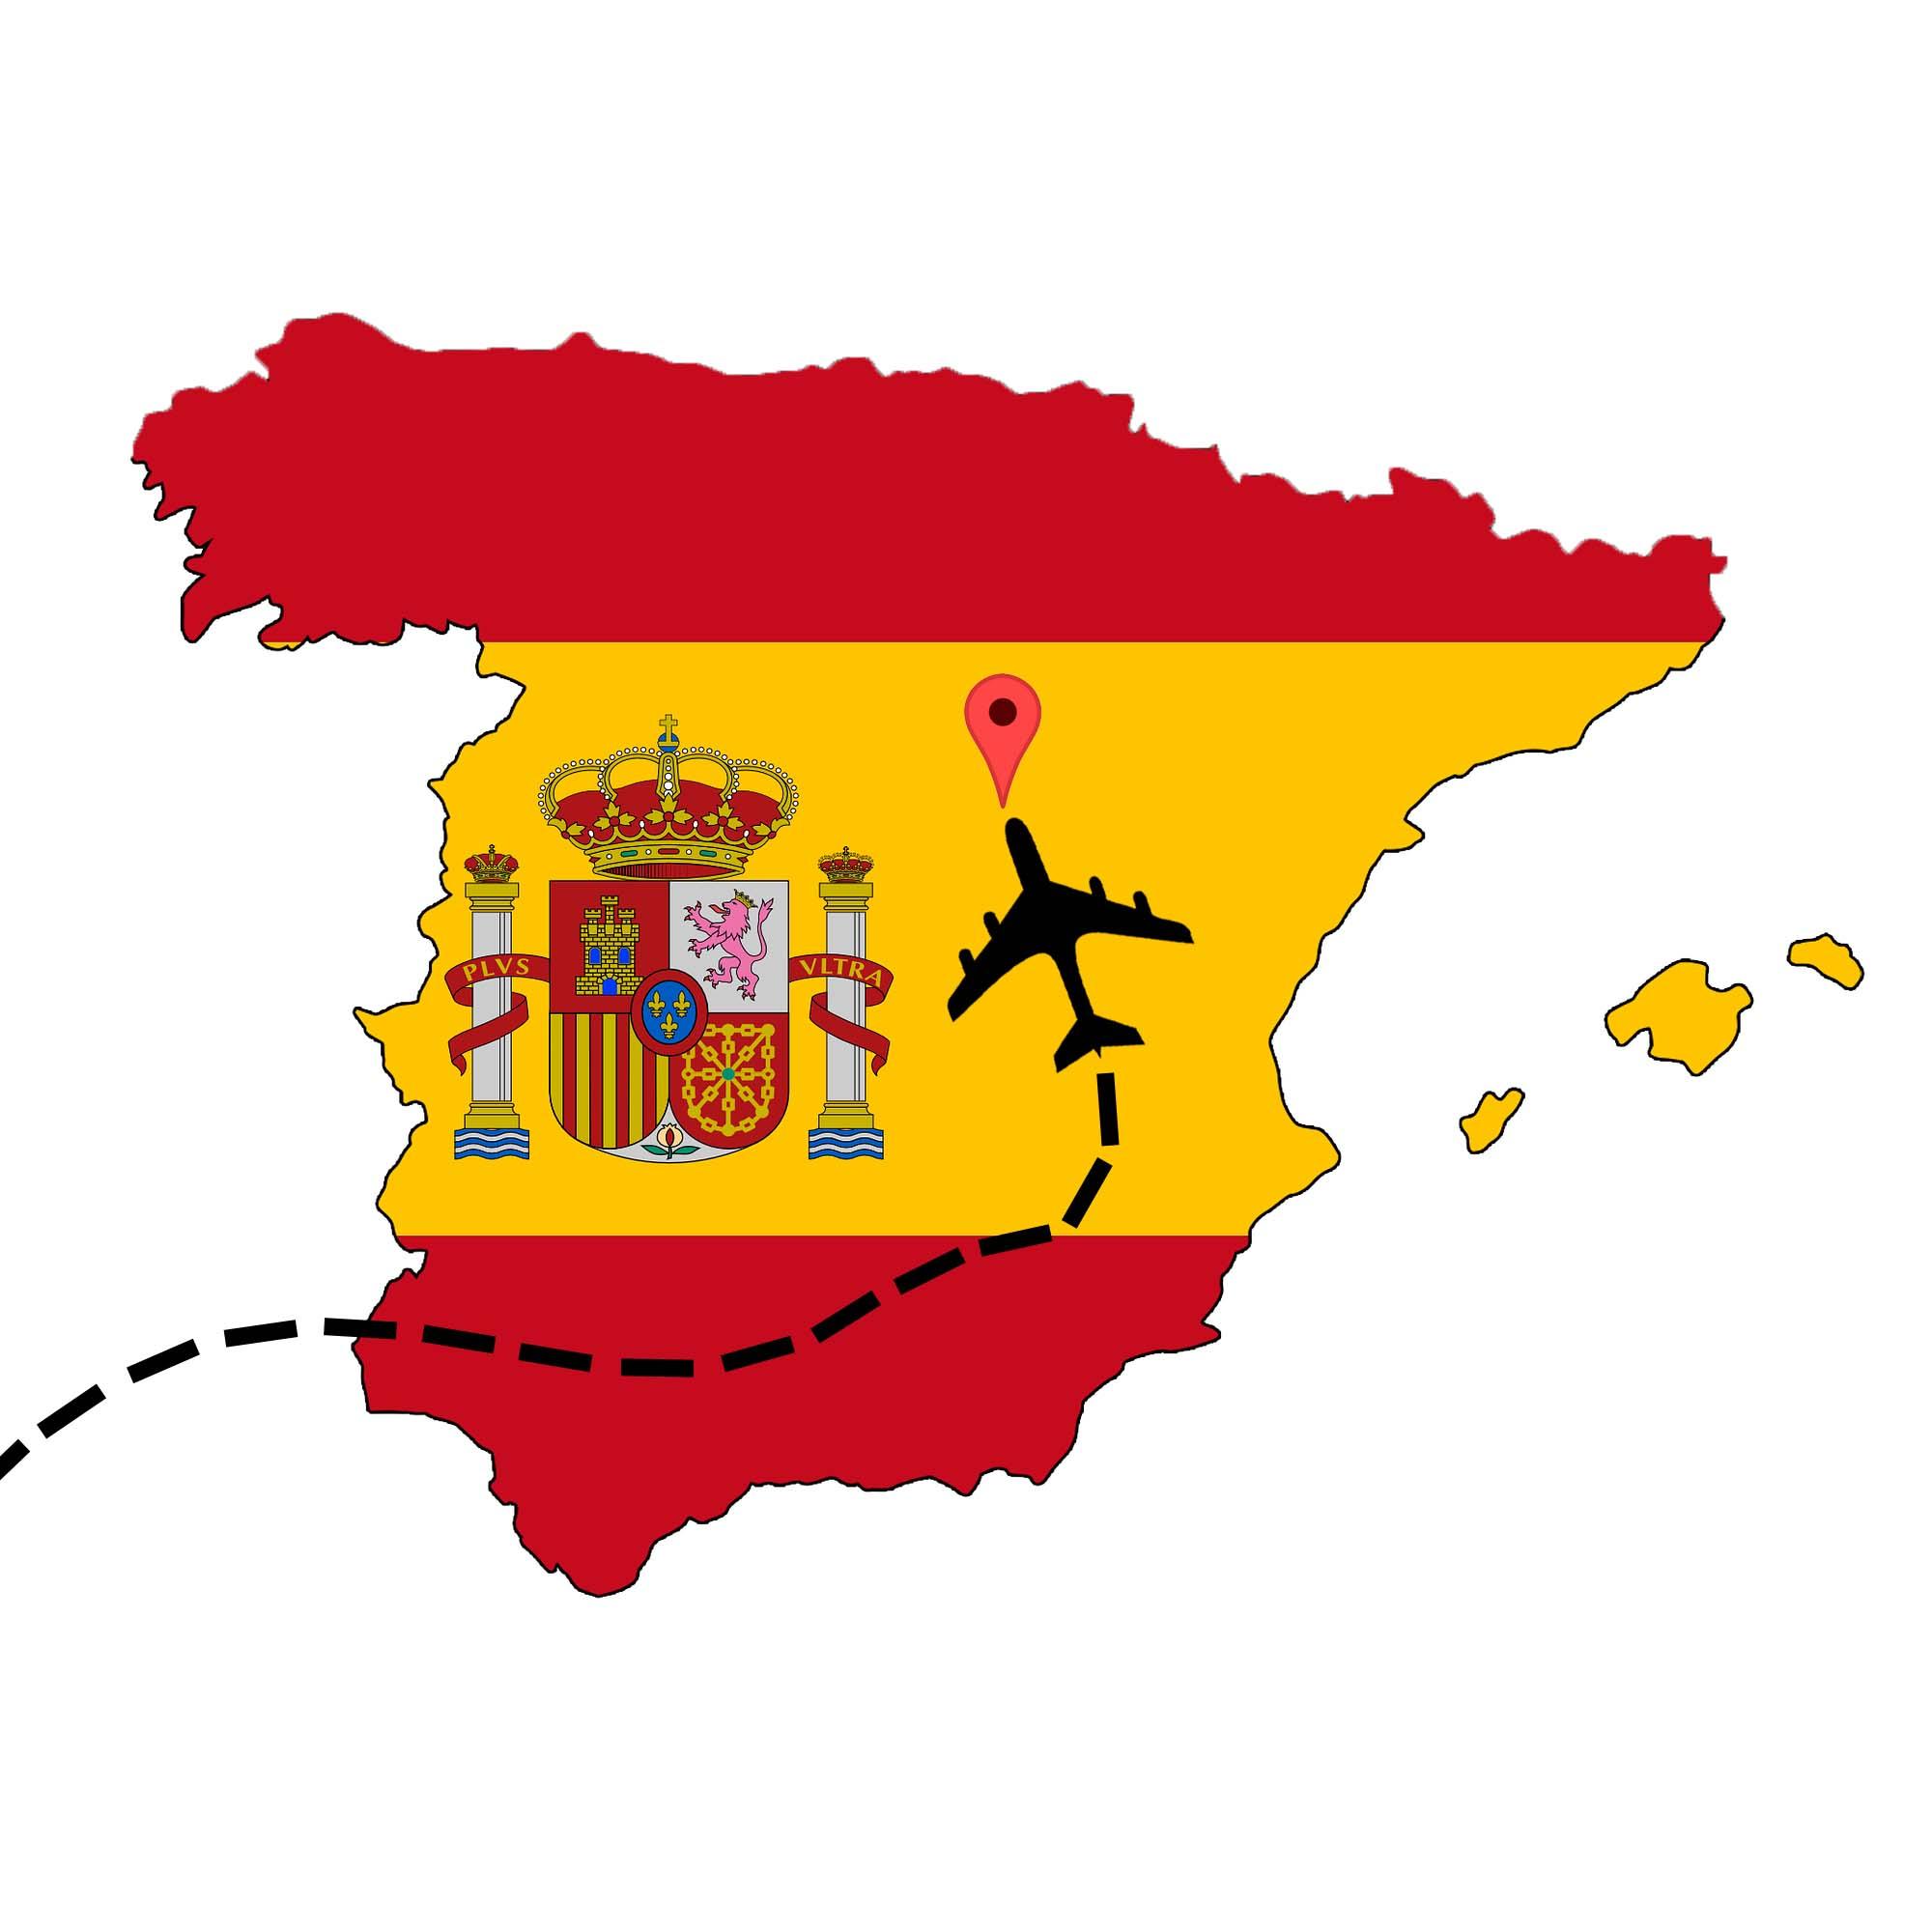 ¡Vamos a España!